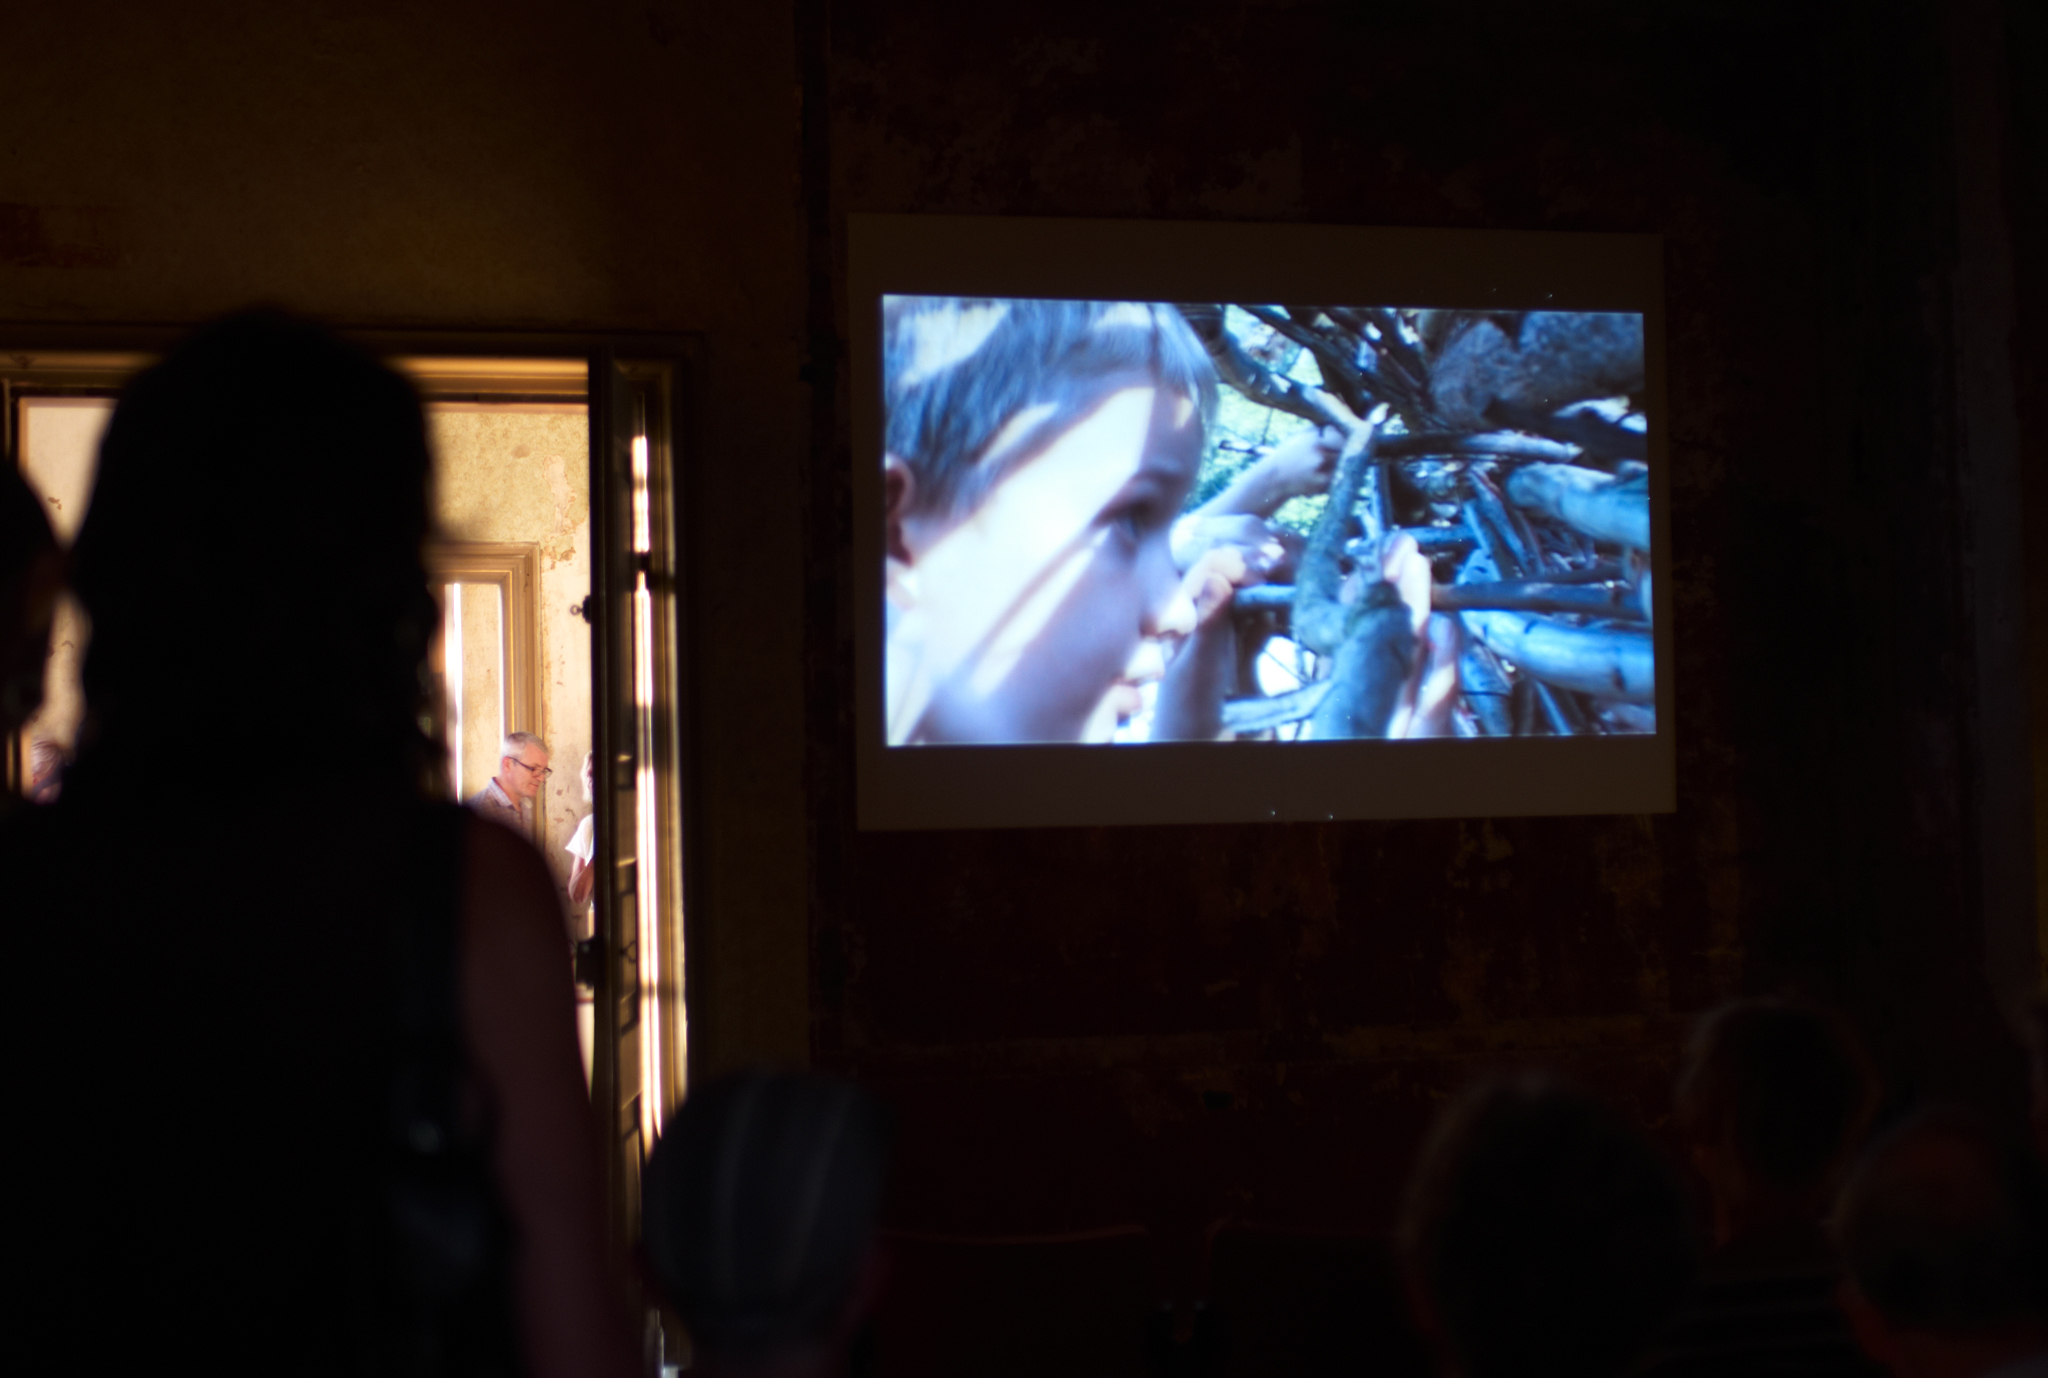 "Rückblick  Videoraum in der Ausstellung ""ENTFALTUNG"" von Andreas Hetfeld im Barockschloss Wachau 2018, Foto: Karsten Moll © ORLA e. V."